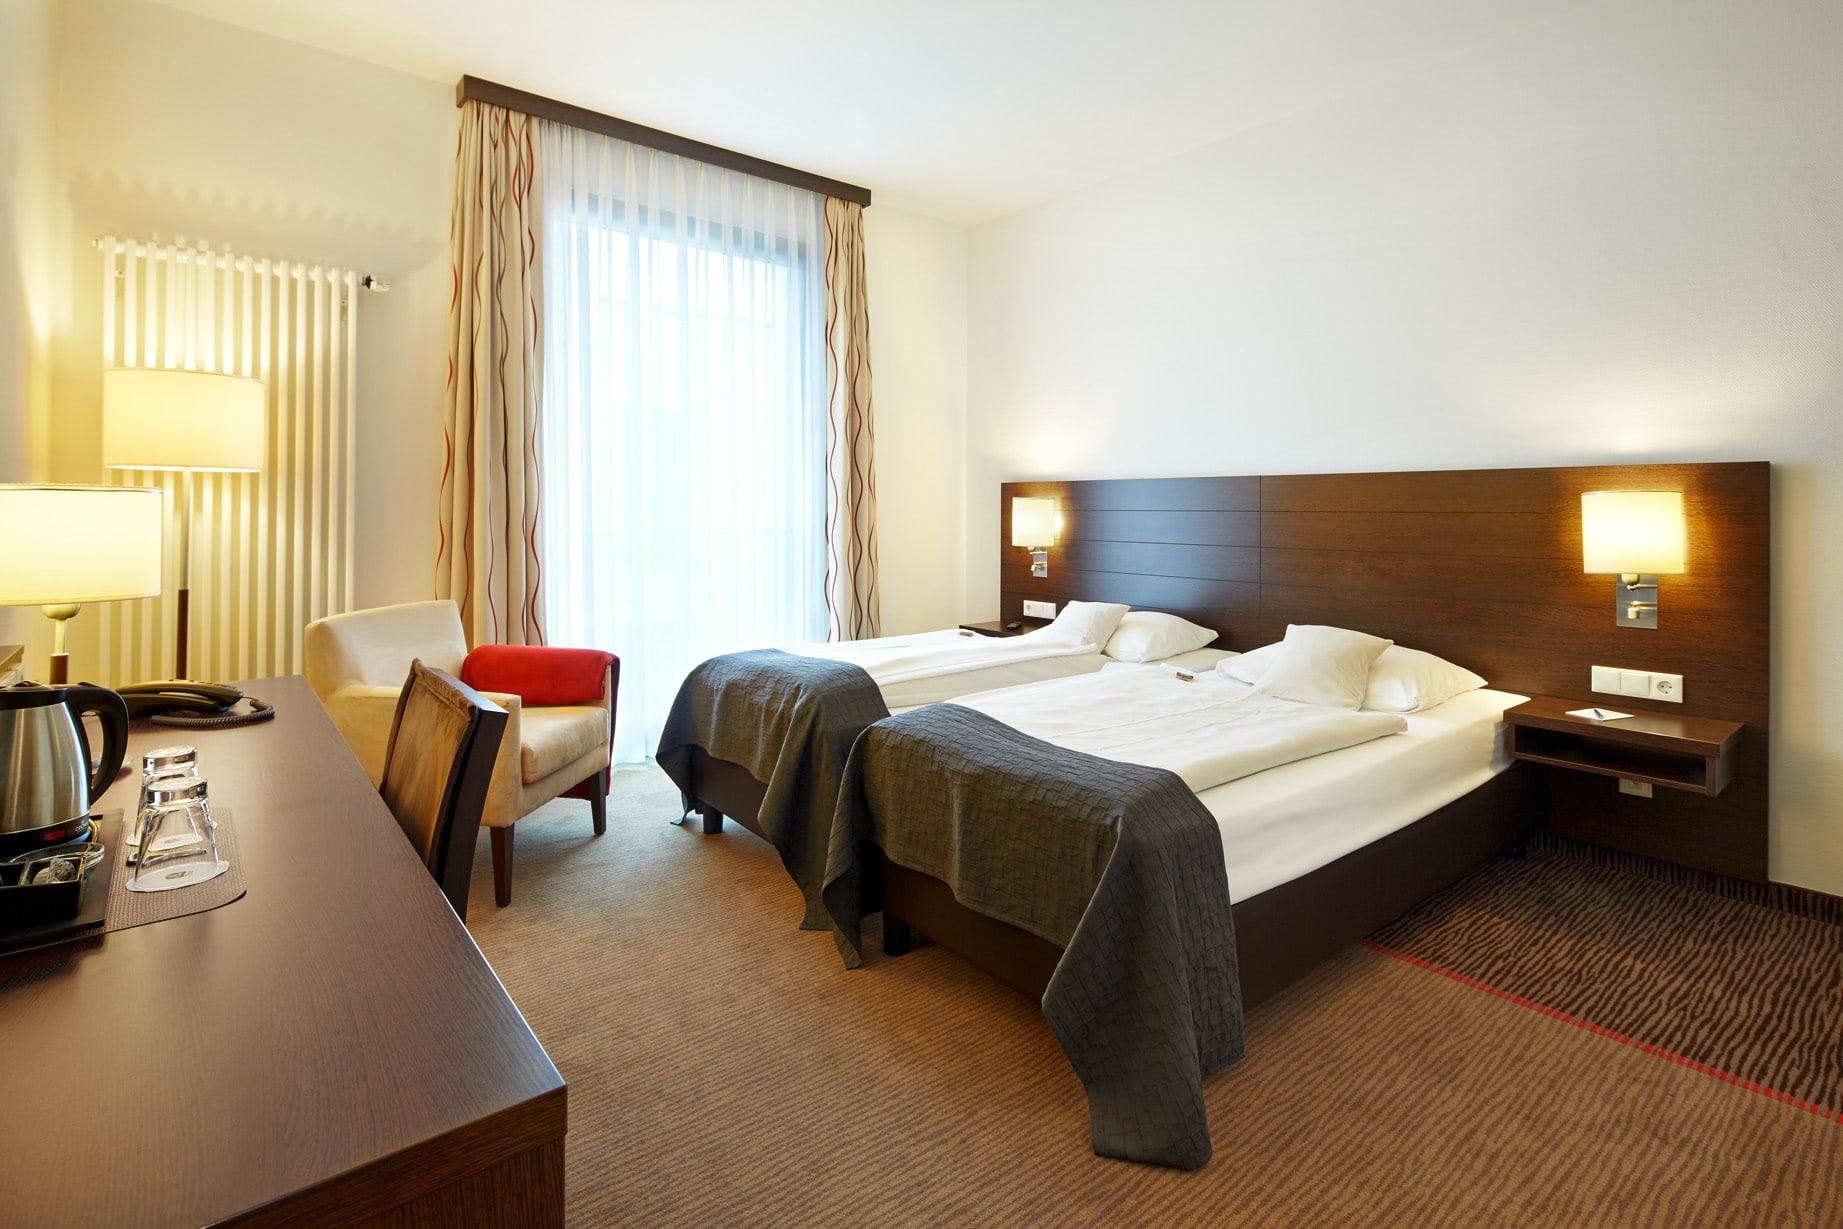 Best Western Plus Hotel Ostertor Hotelzimmer